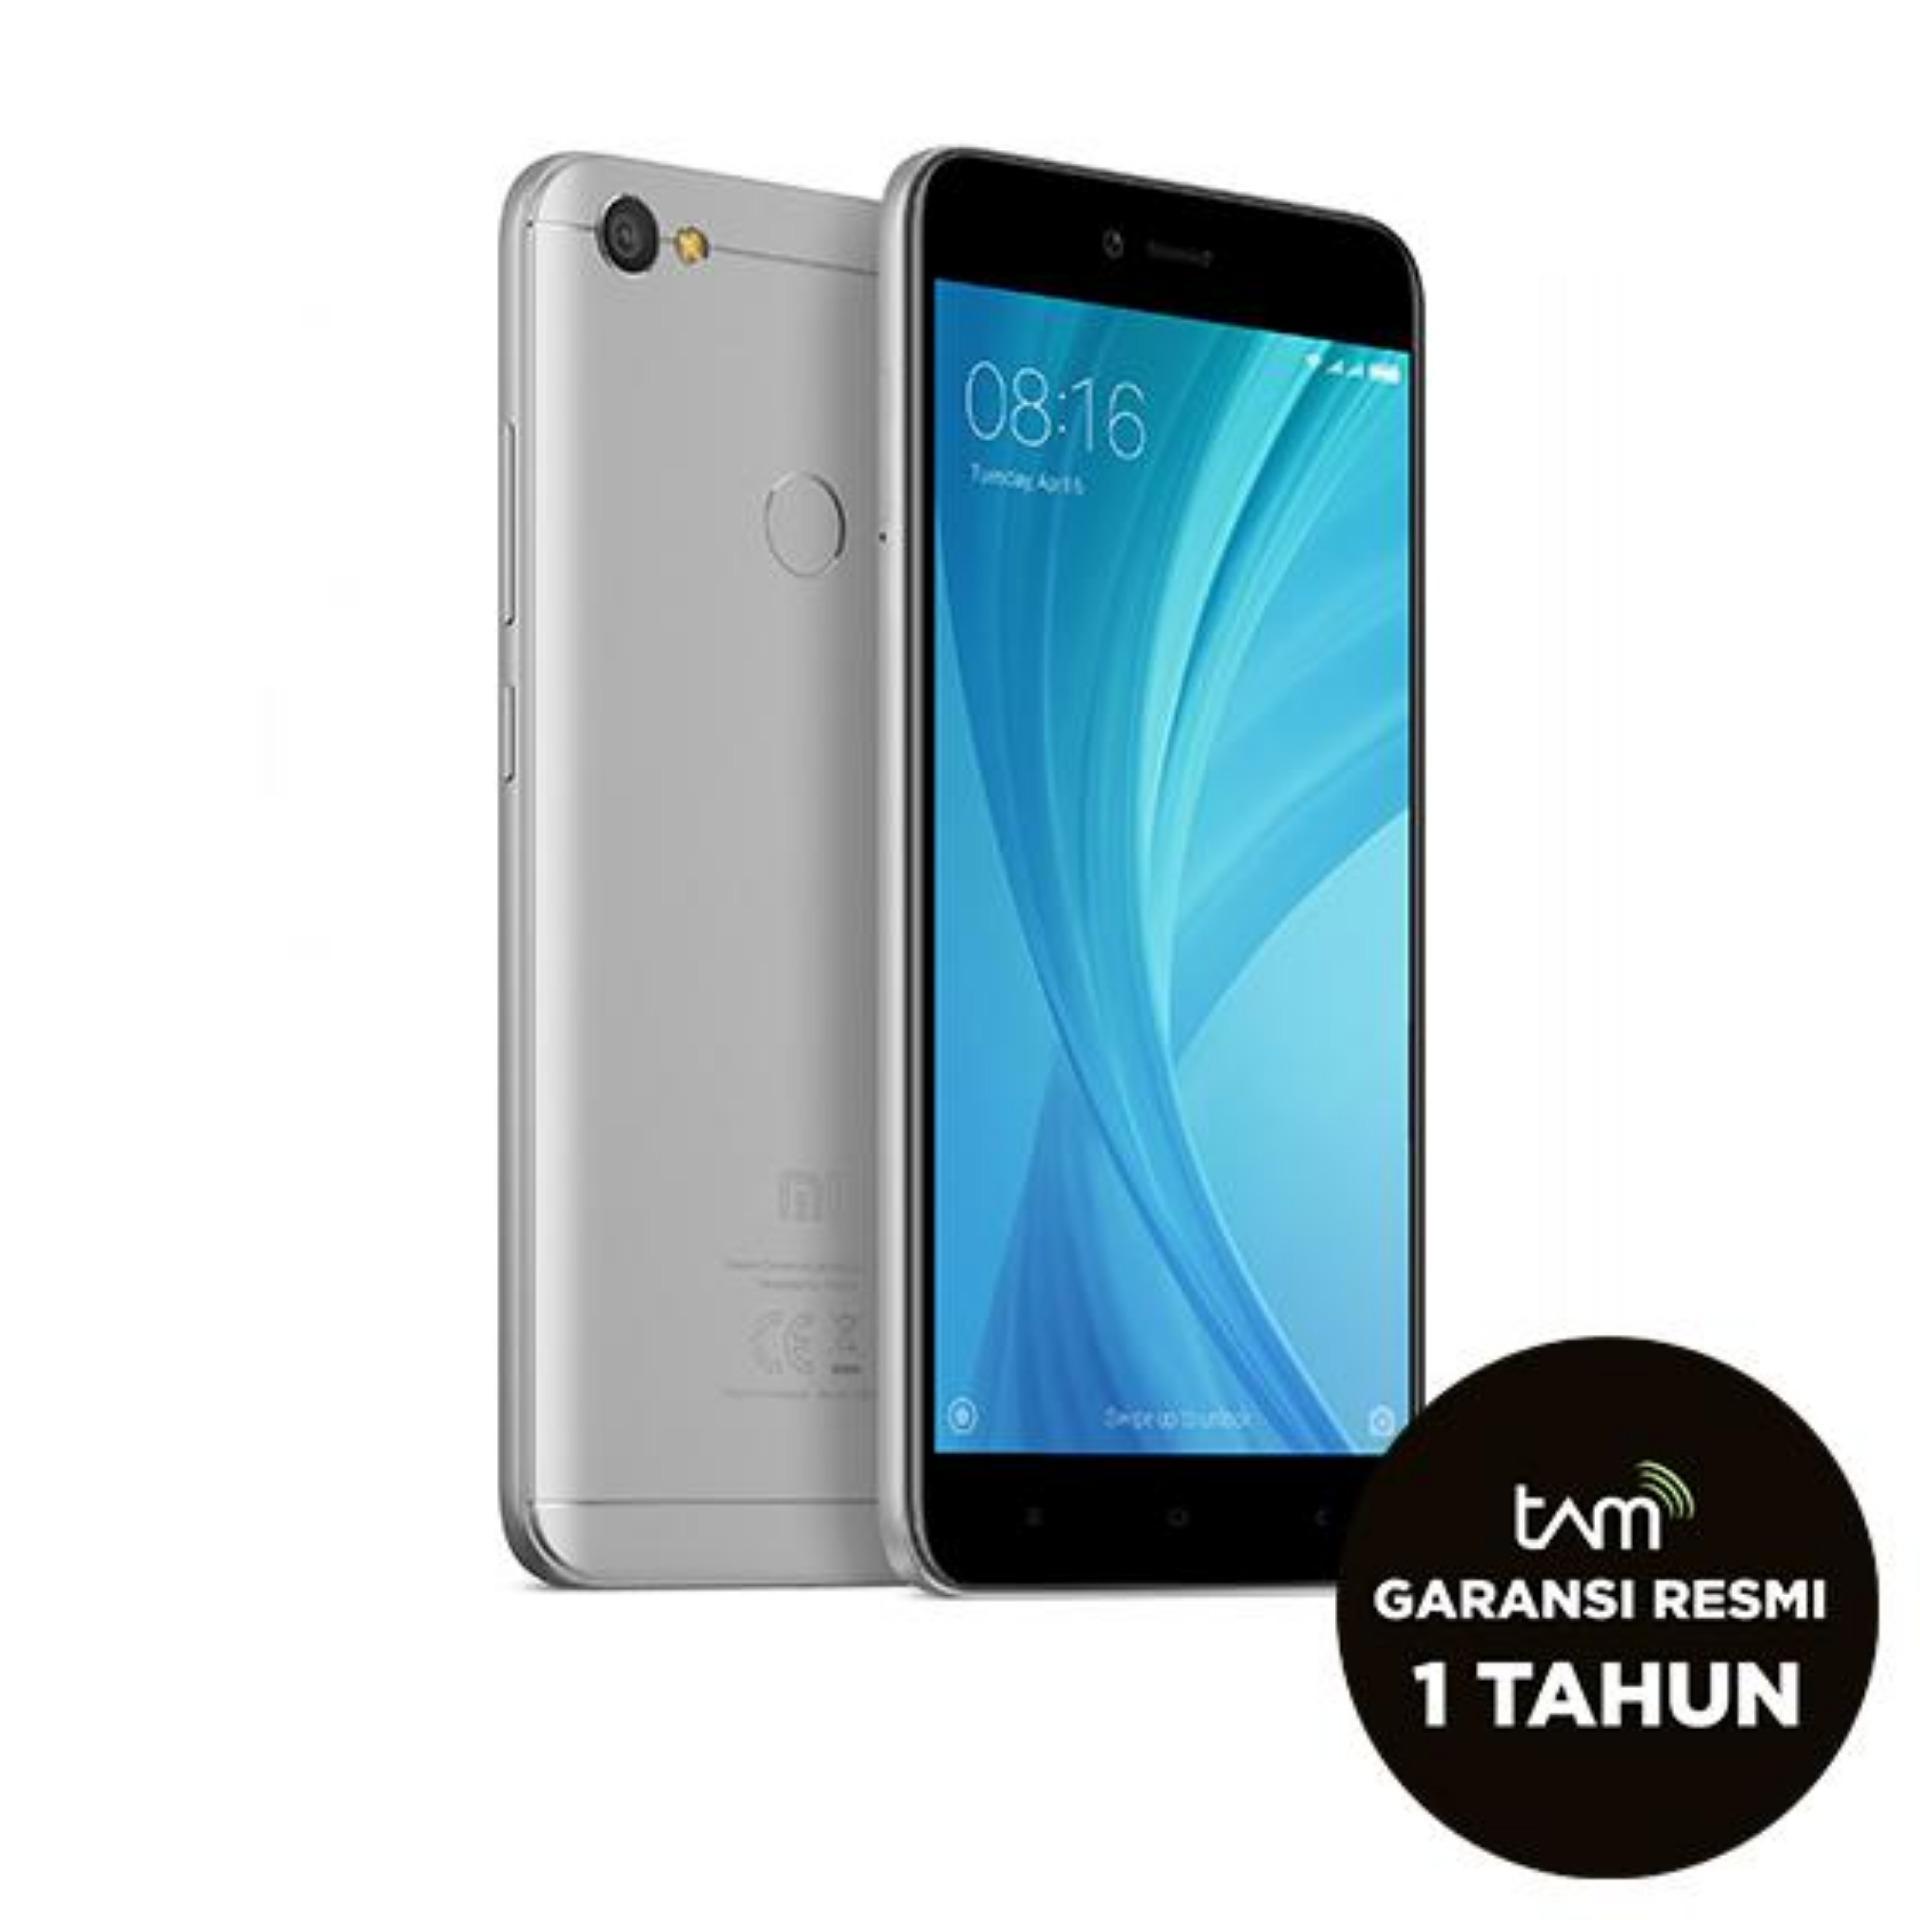 Sale Stock Xiaomi Redmi Note 5a Smartphone Ram 2gb Internal 16gb 4 32gb 3gb Garansi Distributor Prime 3 32 Gb Resmi Tam